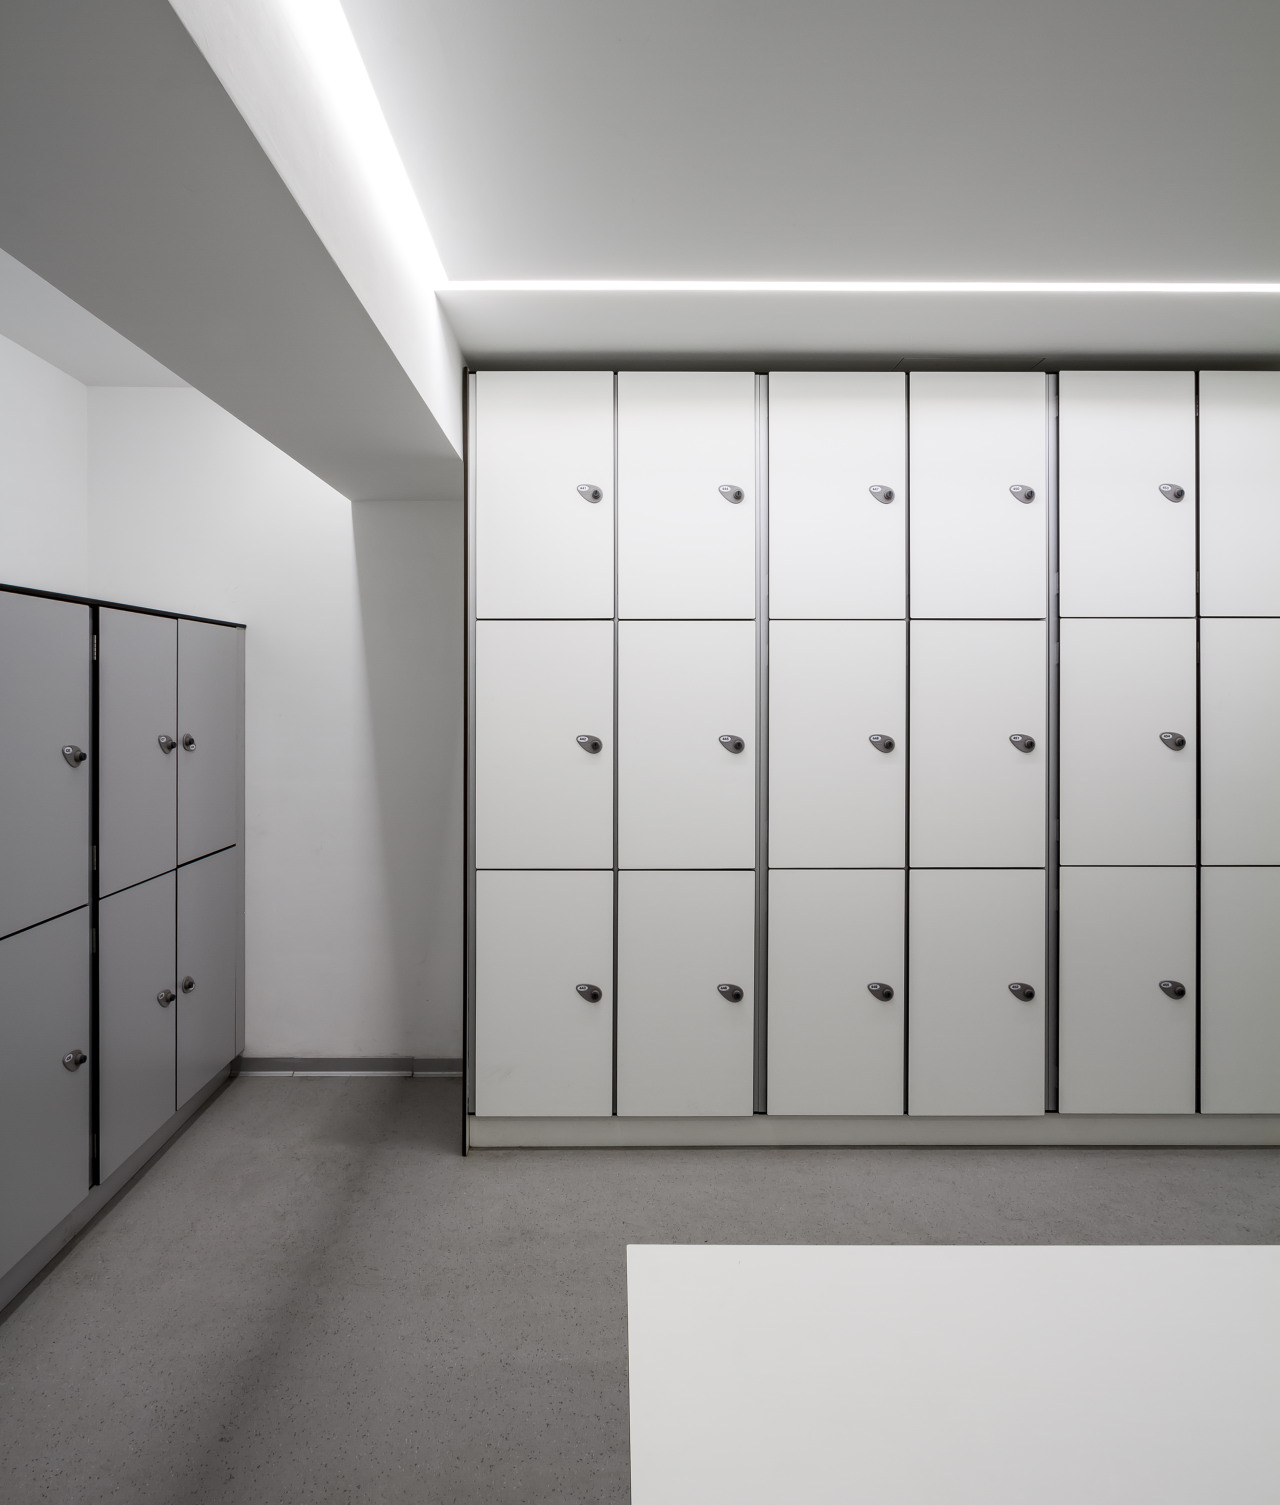 fotografia-arquitectura-valencia-german-cabo-bfm-edificatoria-club-tenis (15)